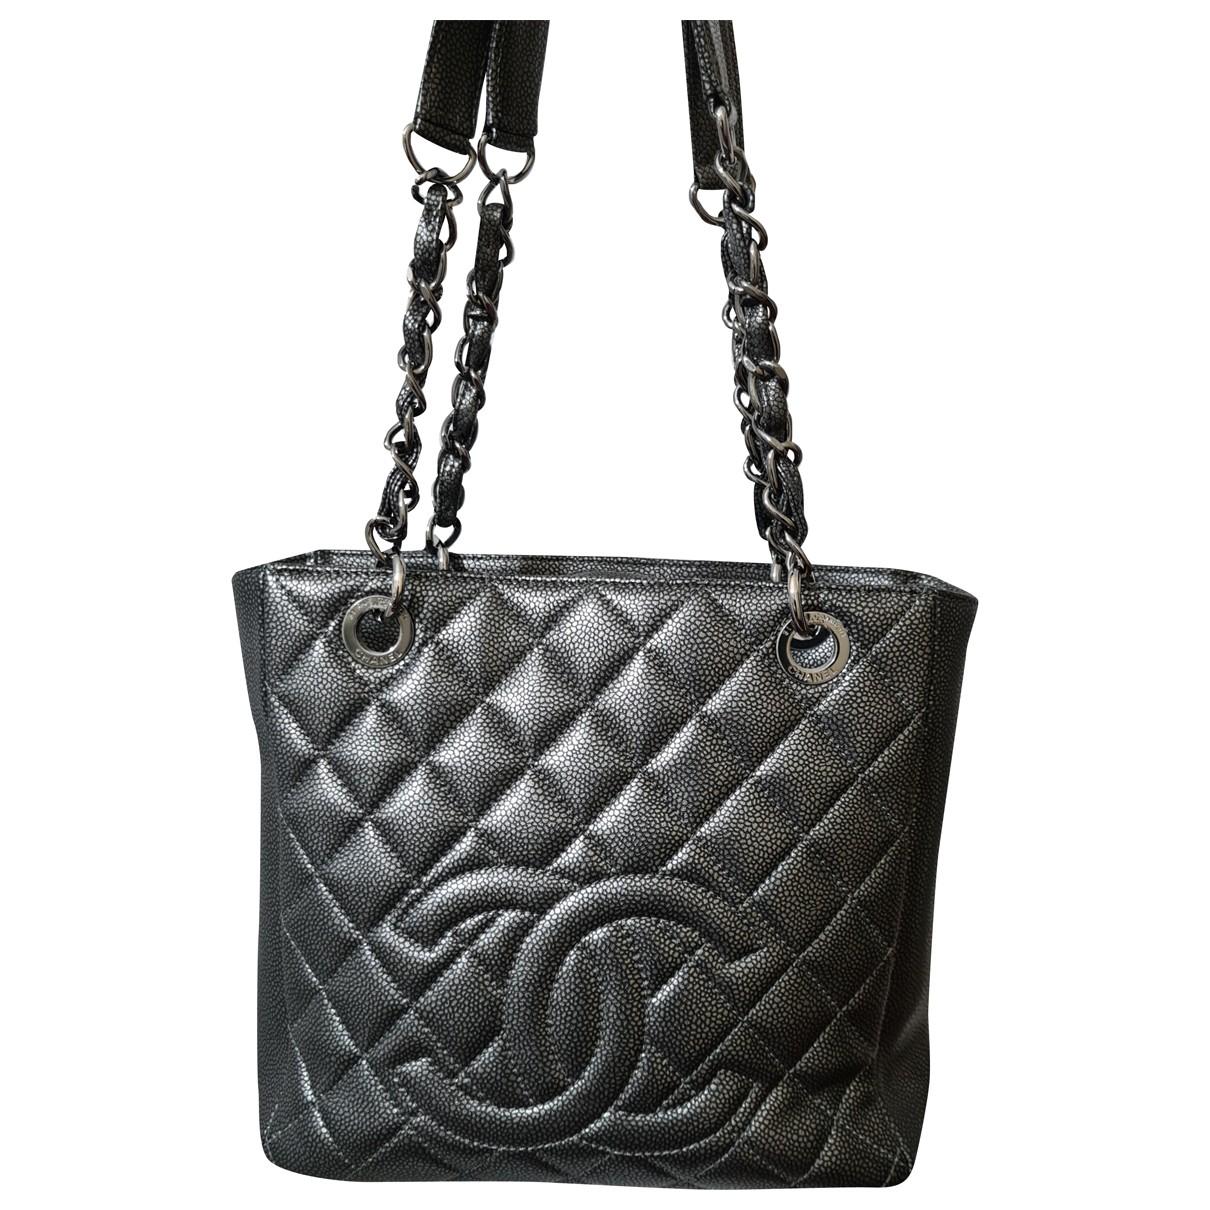 Chanel Petite Shopping Tote Grey Leather handbag for Women N